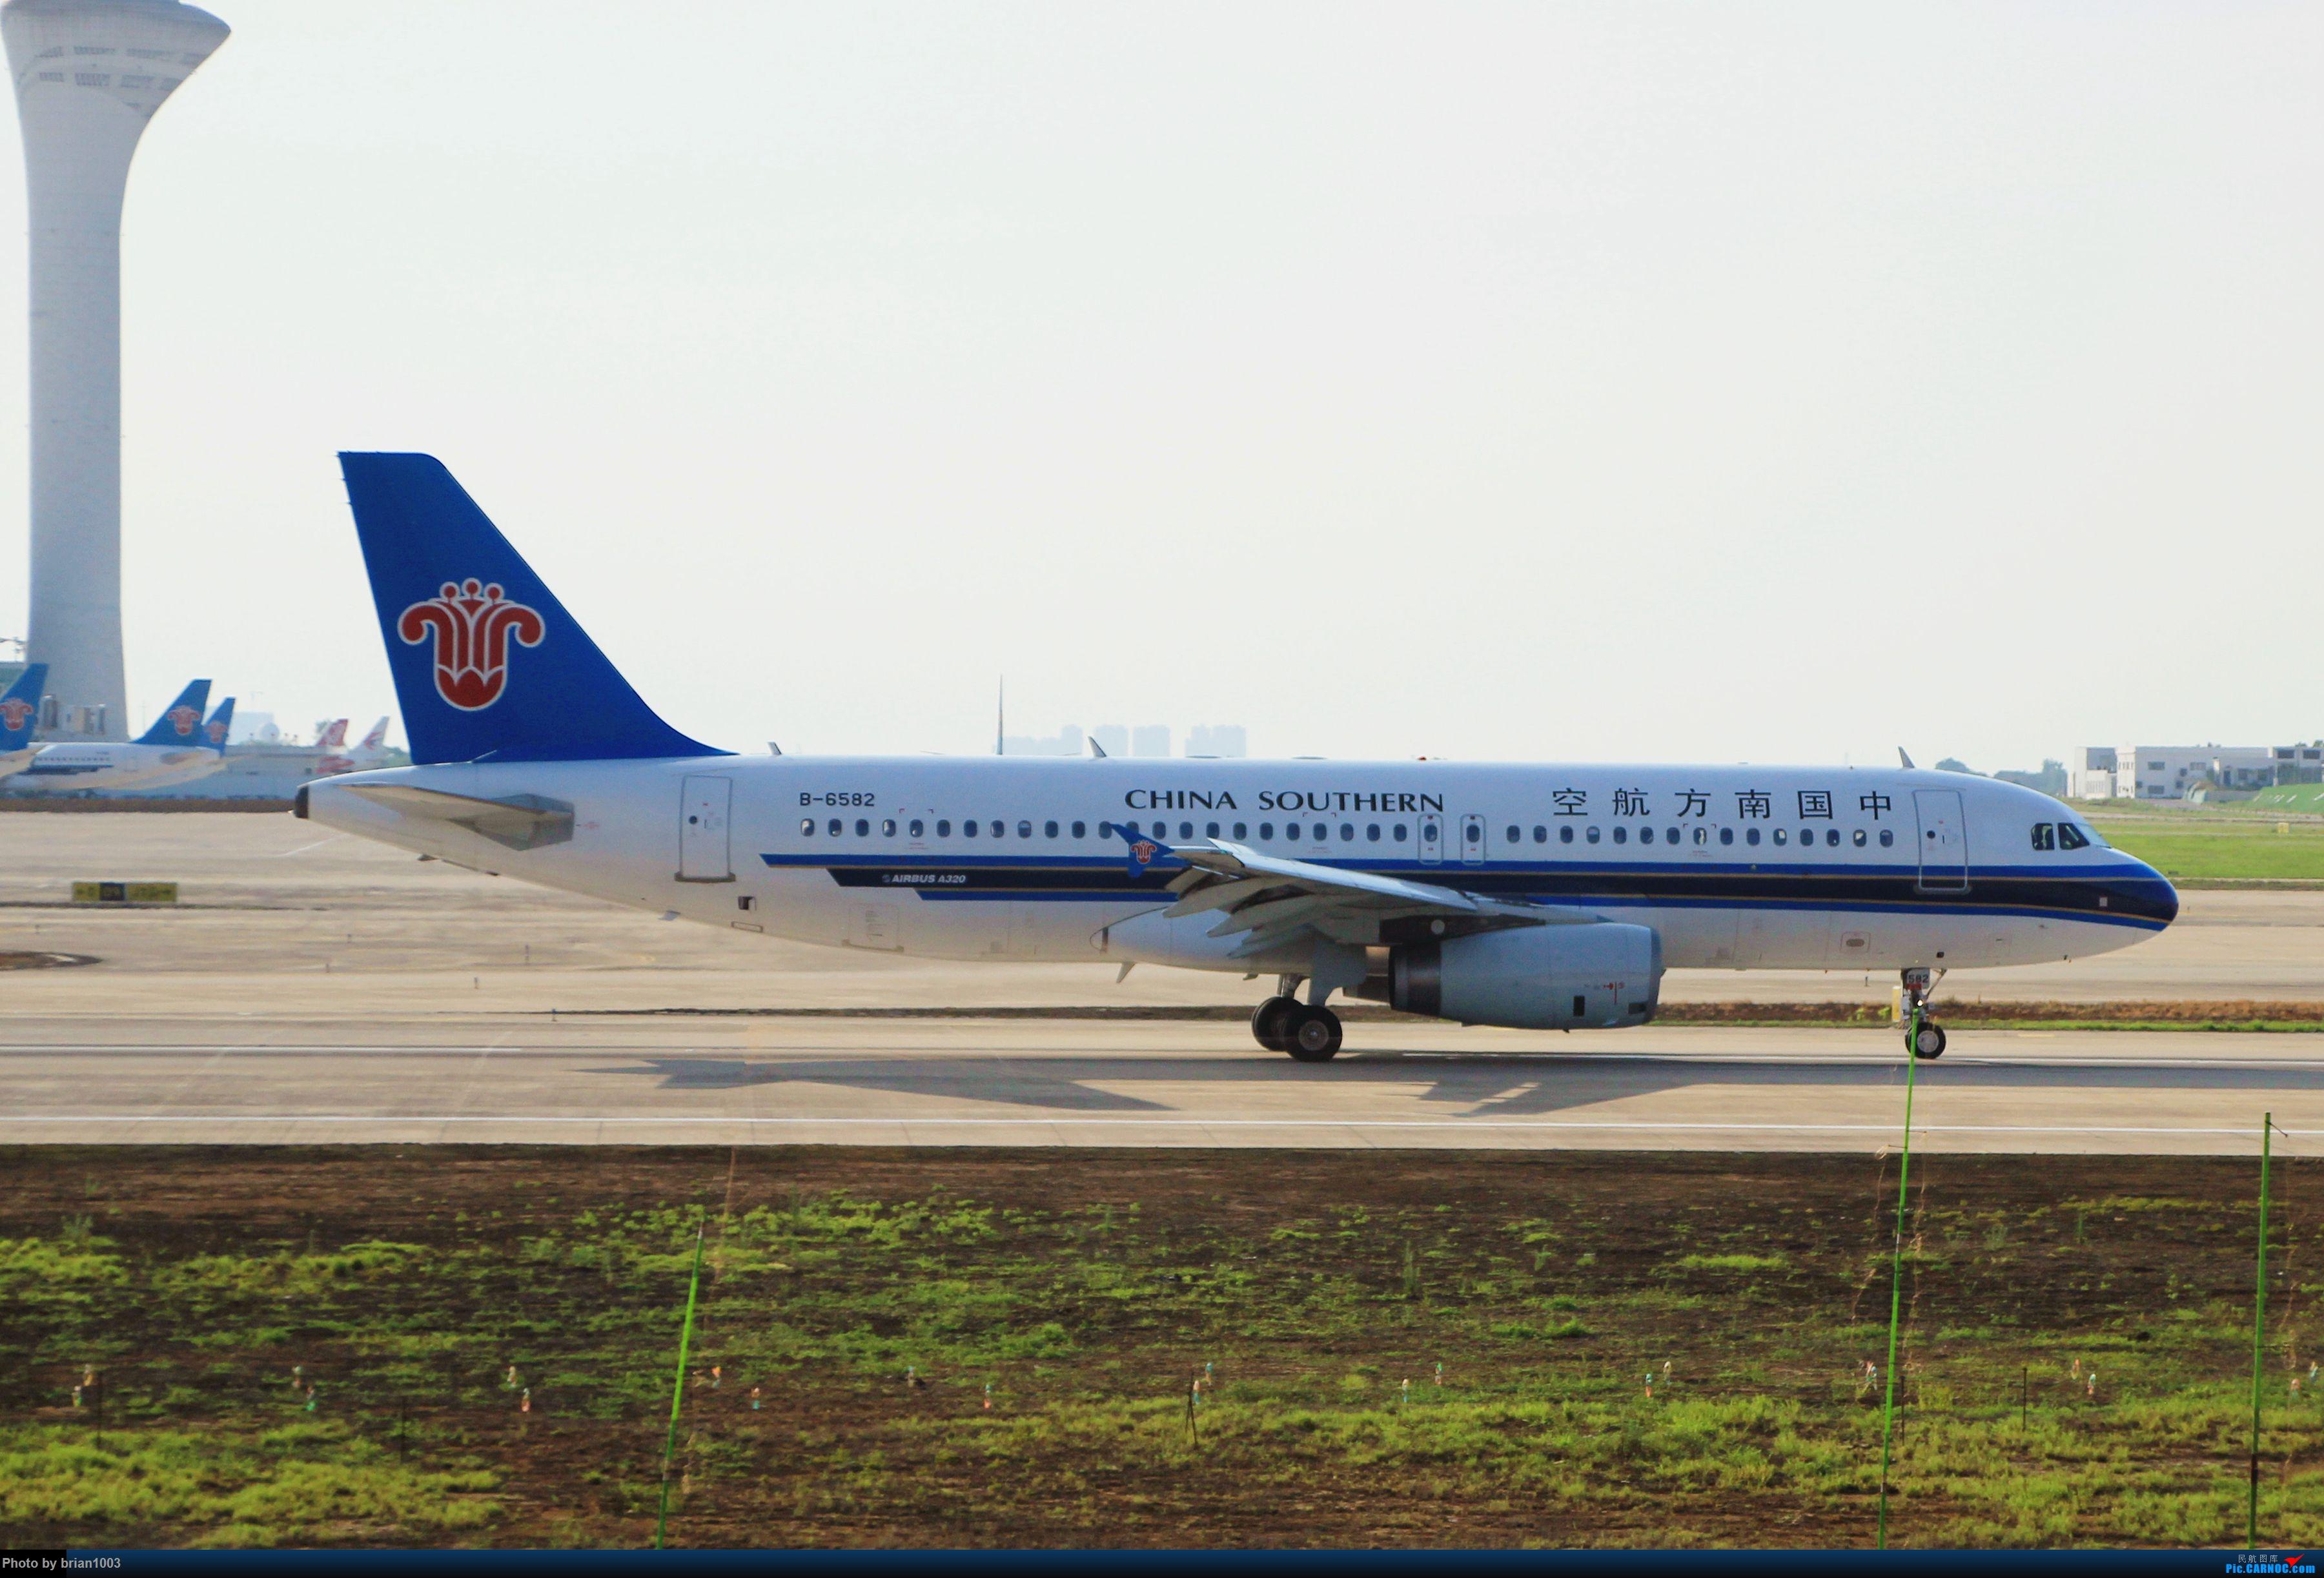 Re:[原创]WUH武汉天河机场拍机之喜迎纽约直飞 AIRBUS A320-200 B-6582 中国武汉天河国际机场